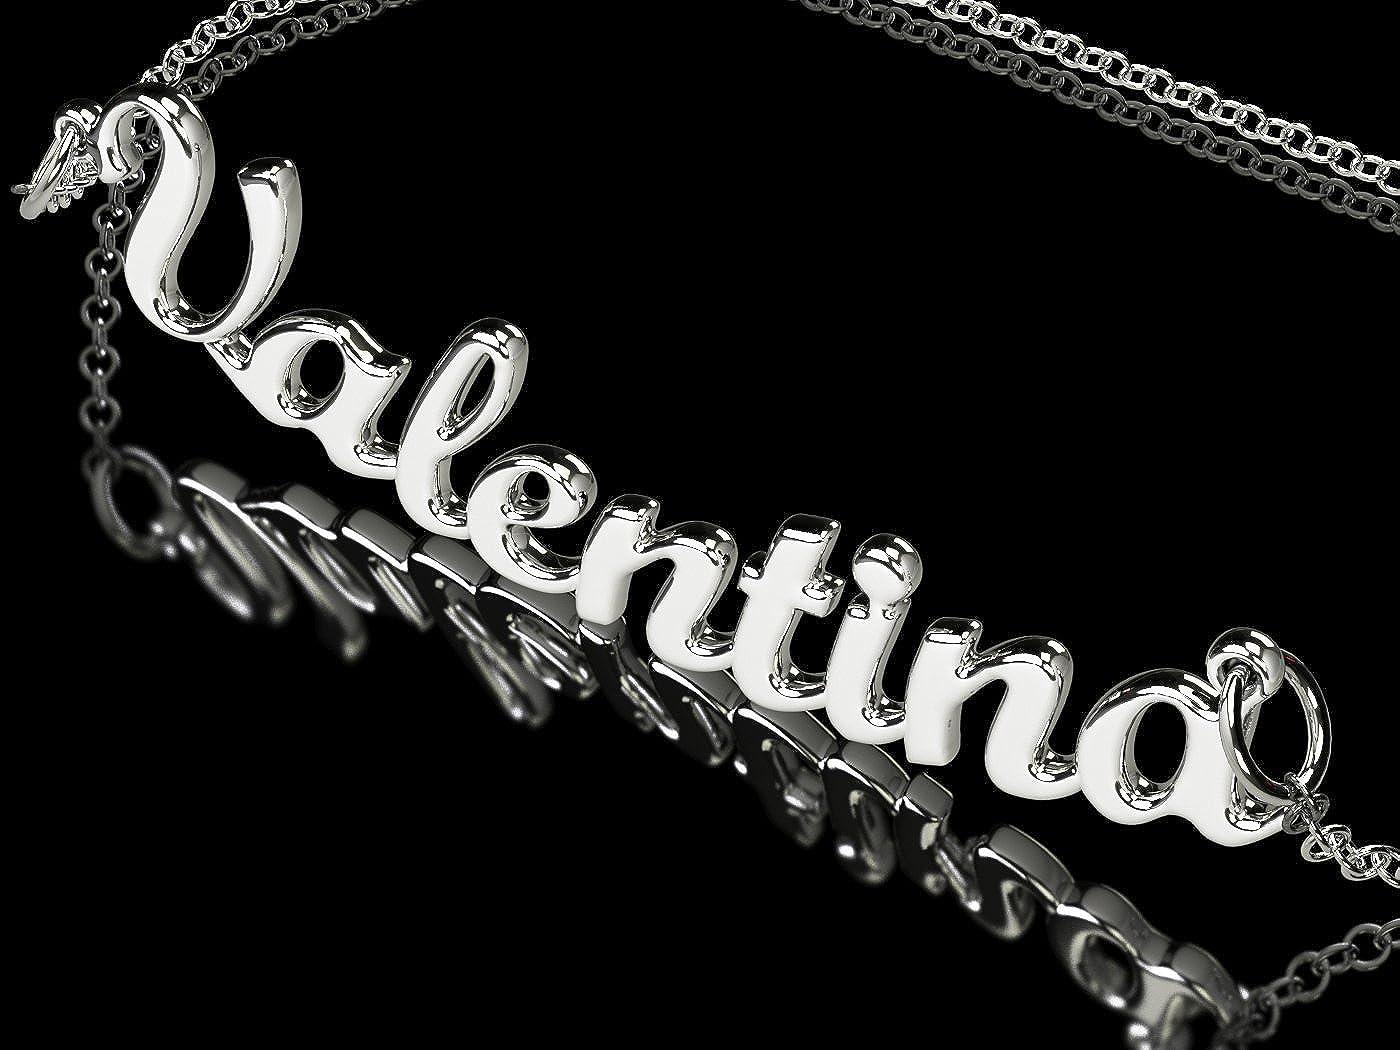 Collar con nombre Valentina de plata 925 rodeado antialérgico. Hecho en Italia. Modelo G10: Amazon.es: Joyería